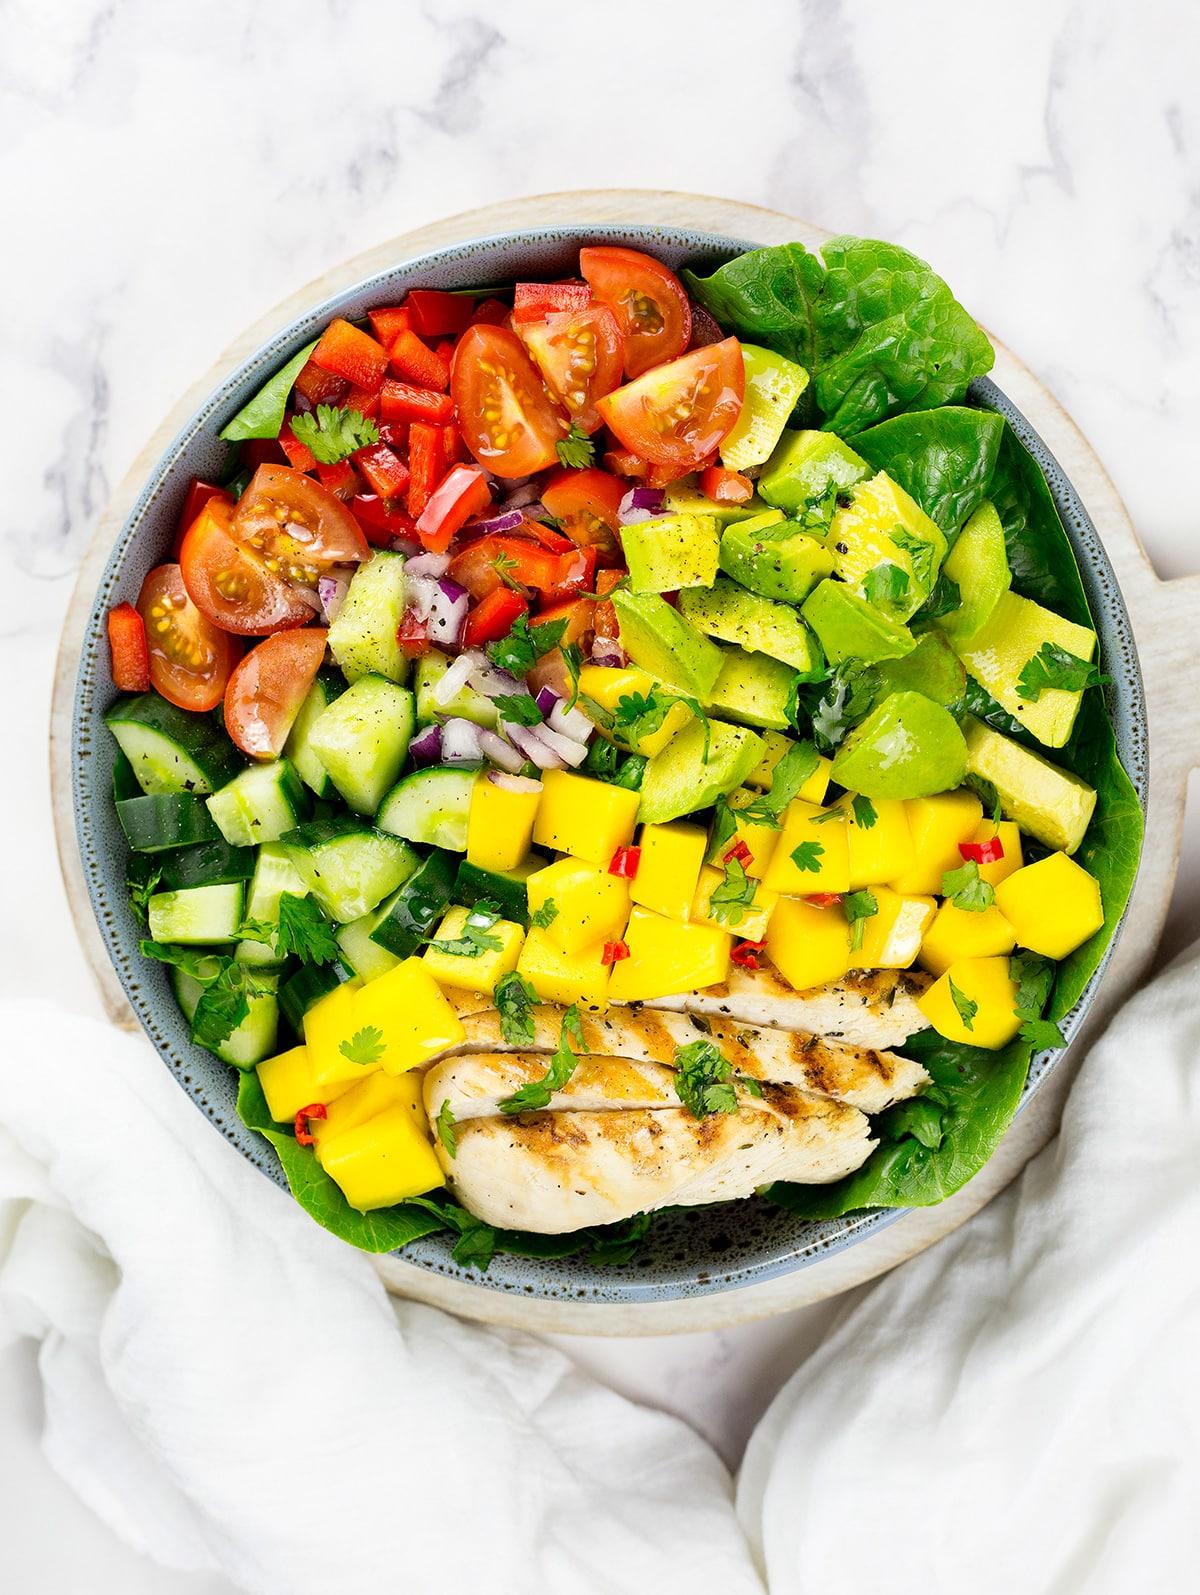 Birdseye view of chicken mango salad inblue/grey dish on white background.